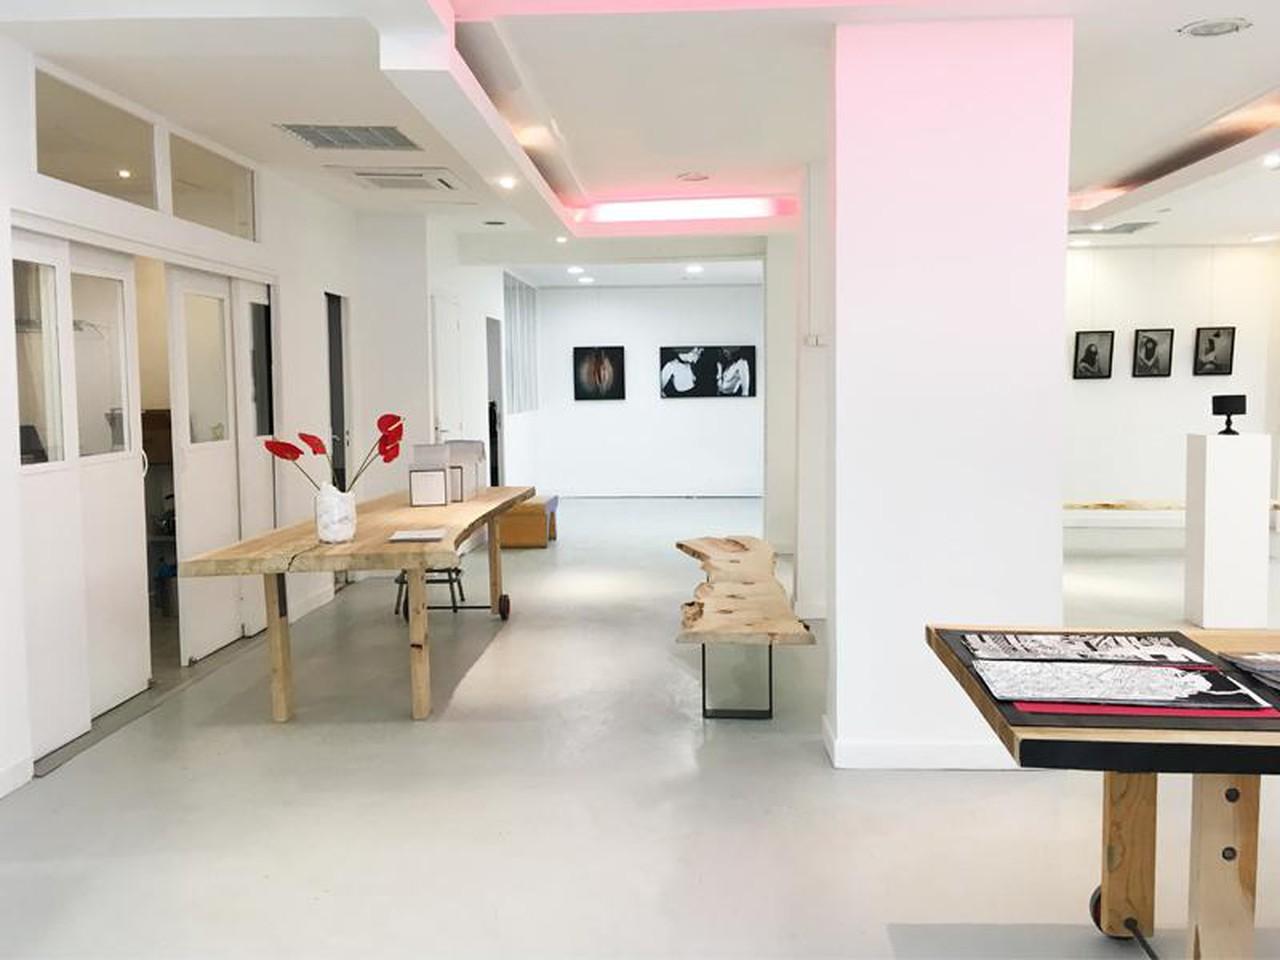 Paris corporate event spaces Galerie Mehrzweck-Galerie image 0